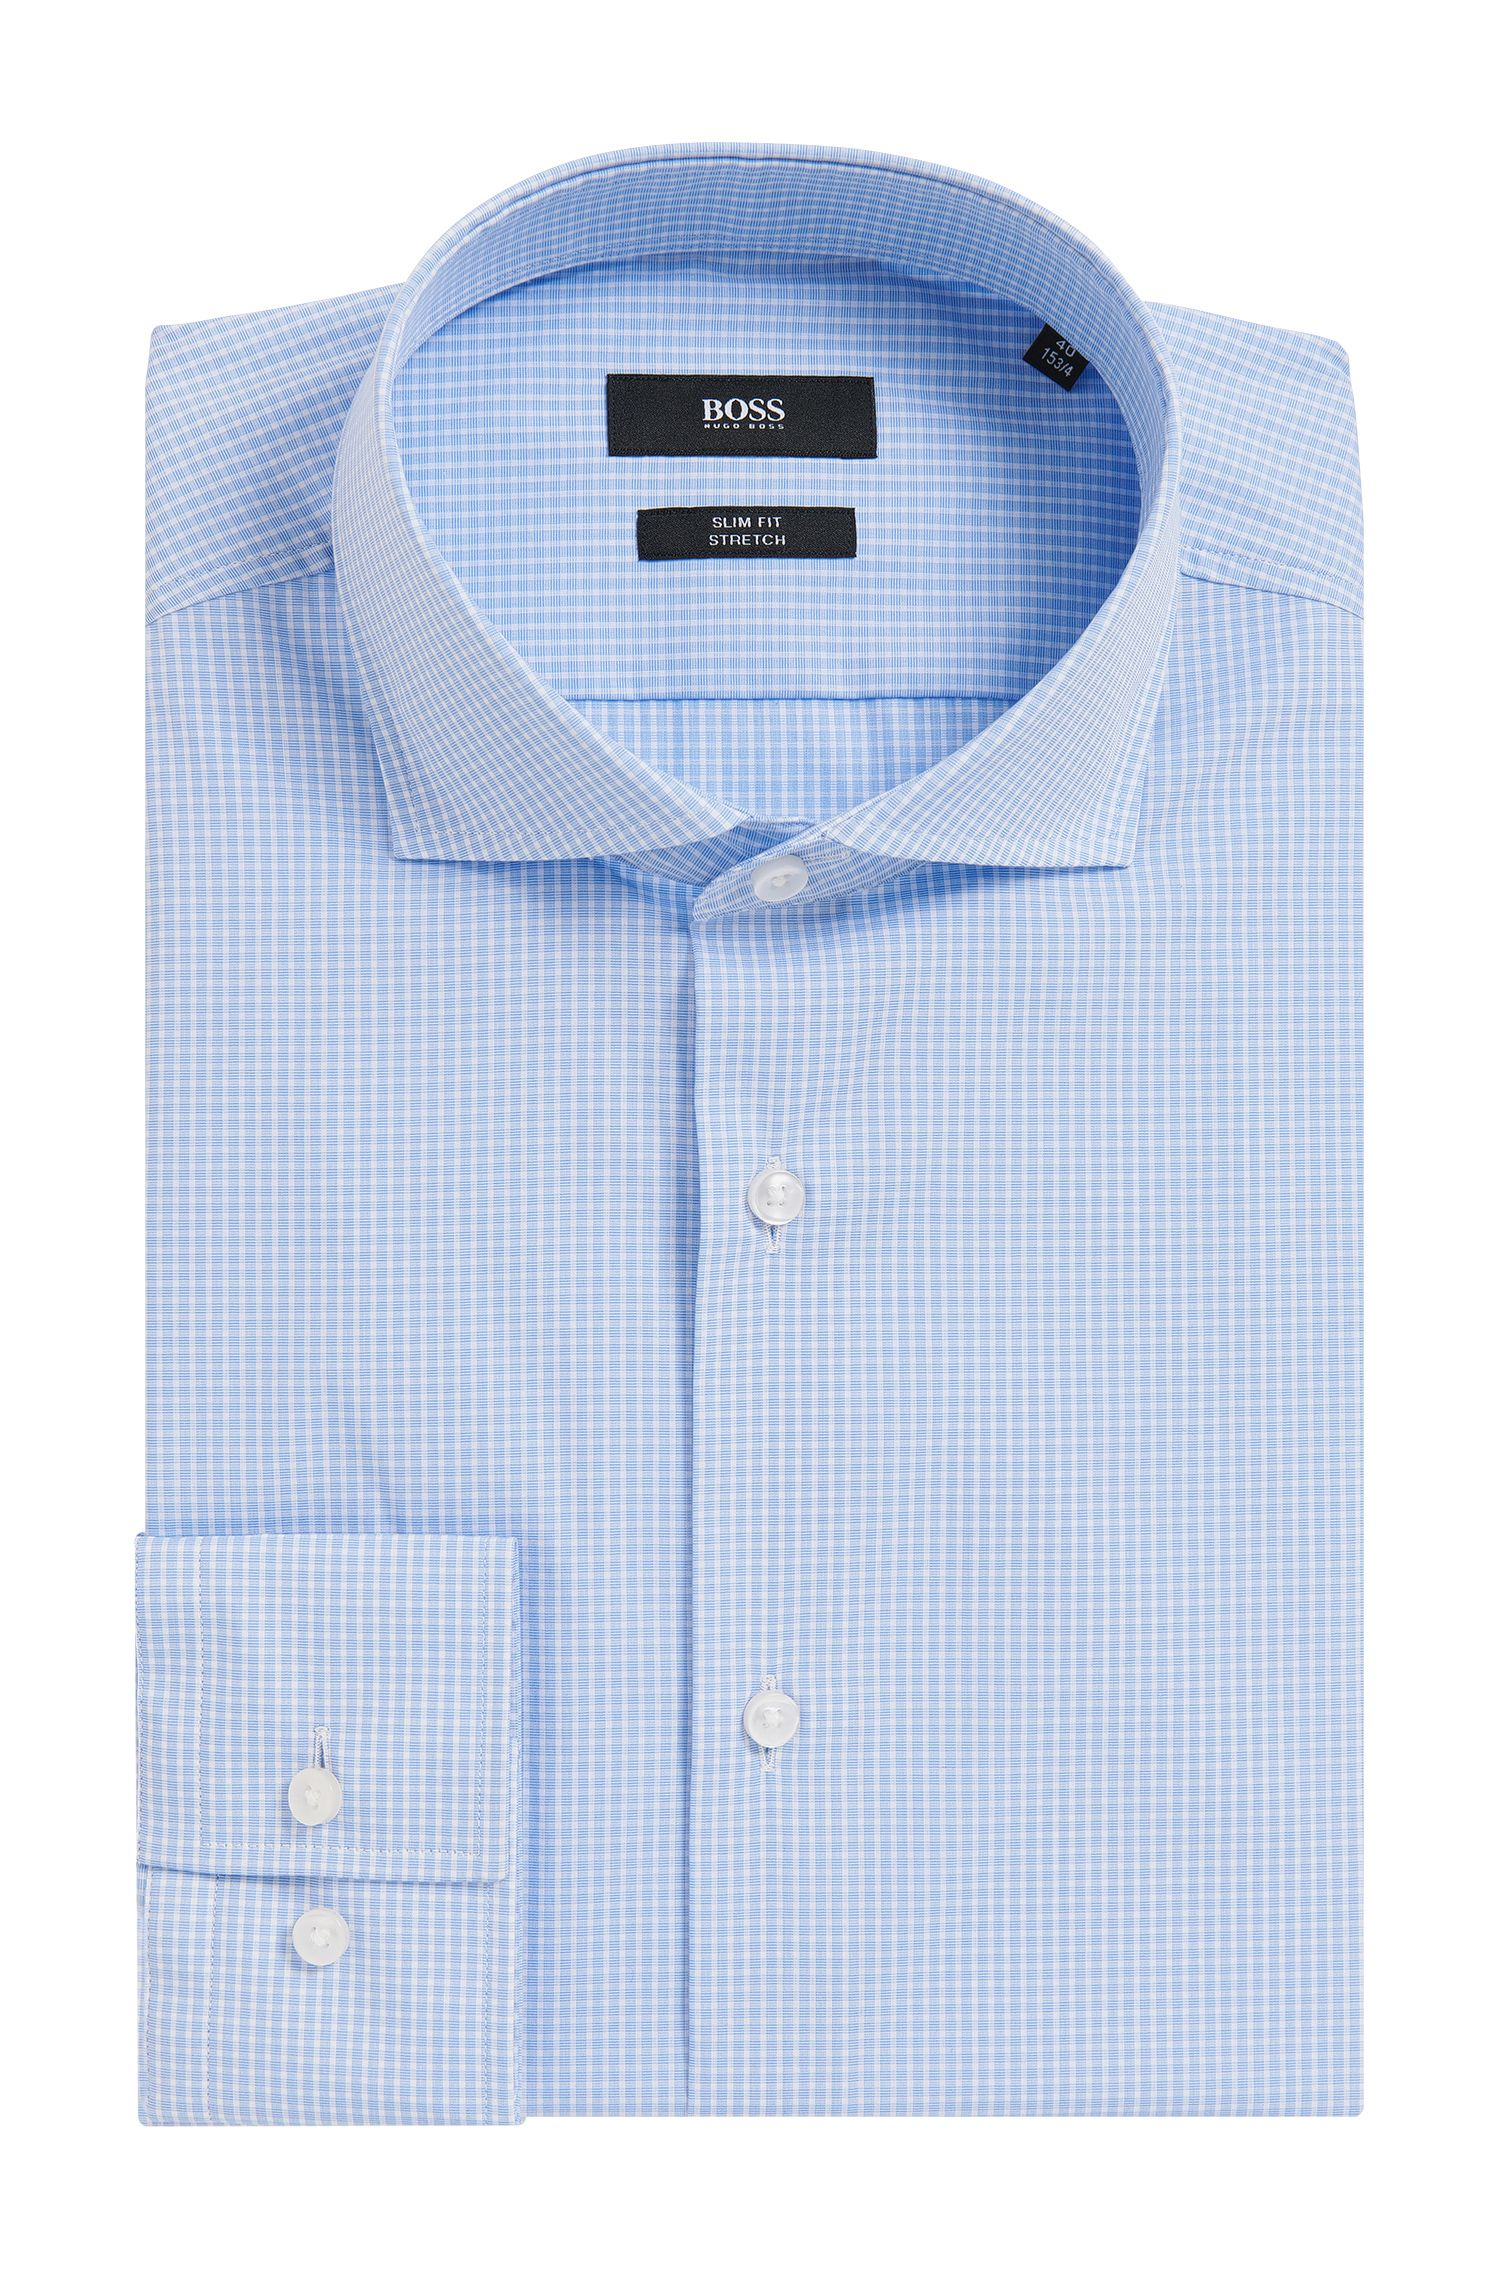 Checked Stretch Cotton Dress Shirt, Slim Fit | Jason